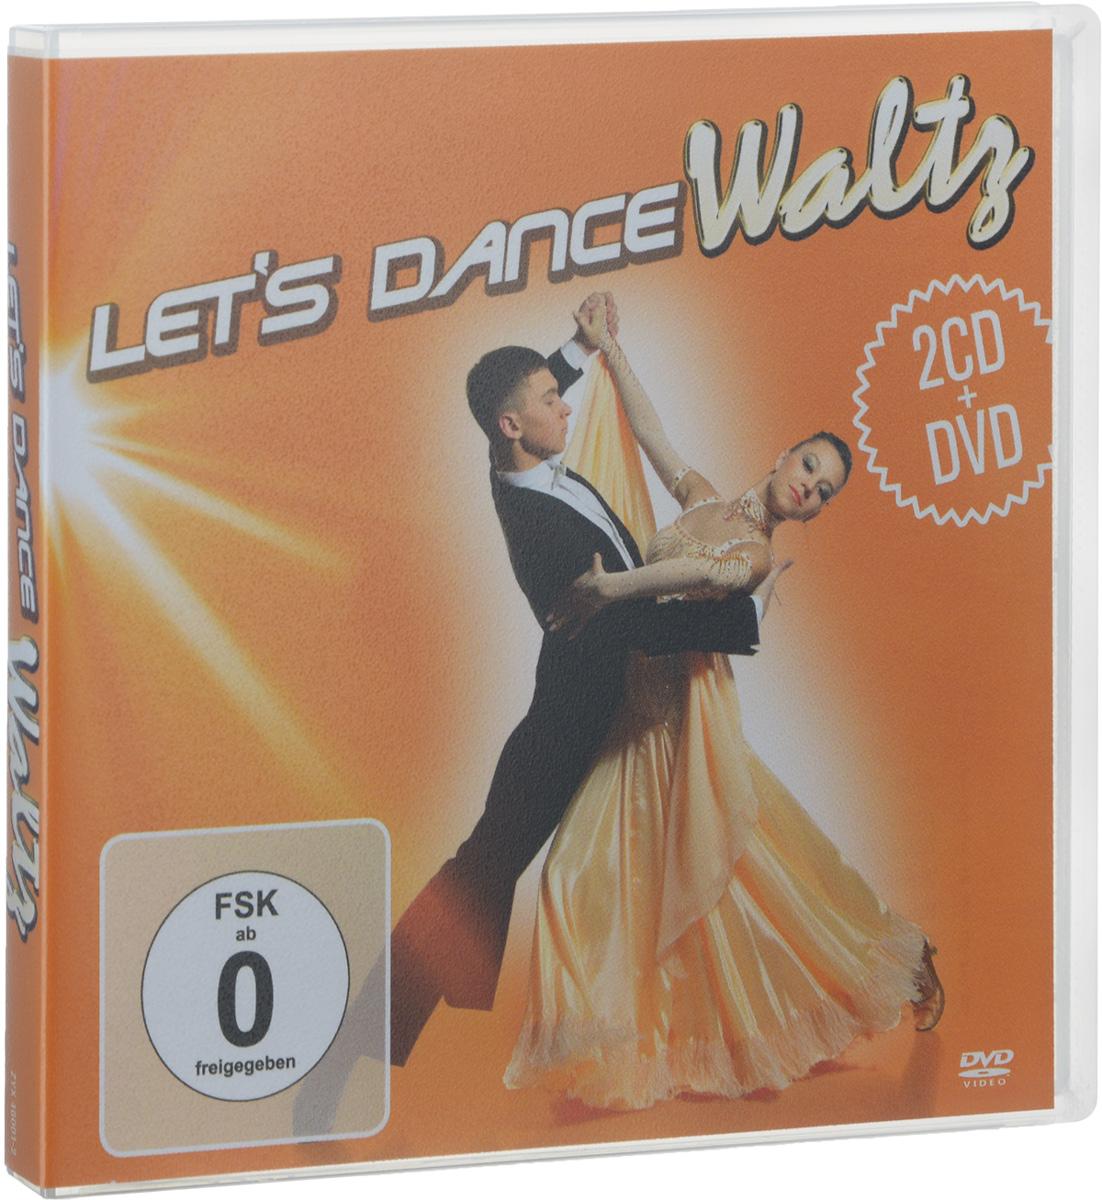 Johann Strauss Orchester,Питер Шмальфусс Let's Dance. Waltz (2 CD + DVD) van der graaf generator van der graaf generator live in concert at metropolis studios london 2 cd dvd